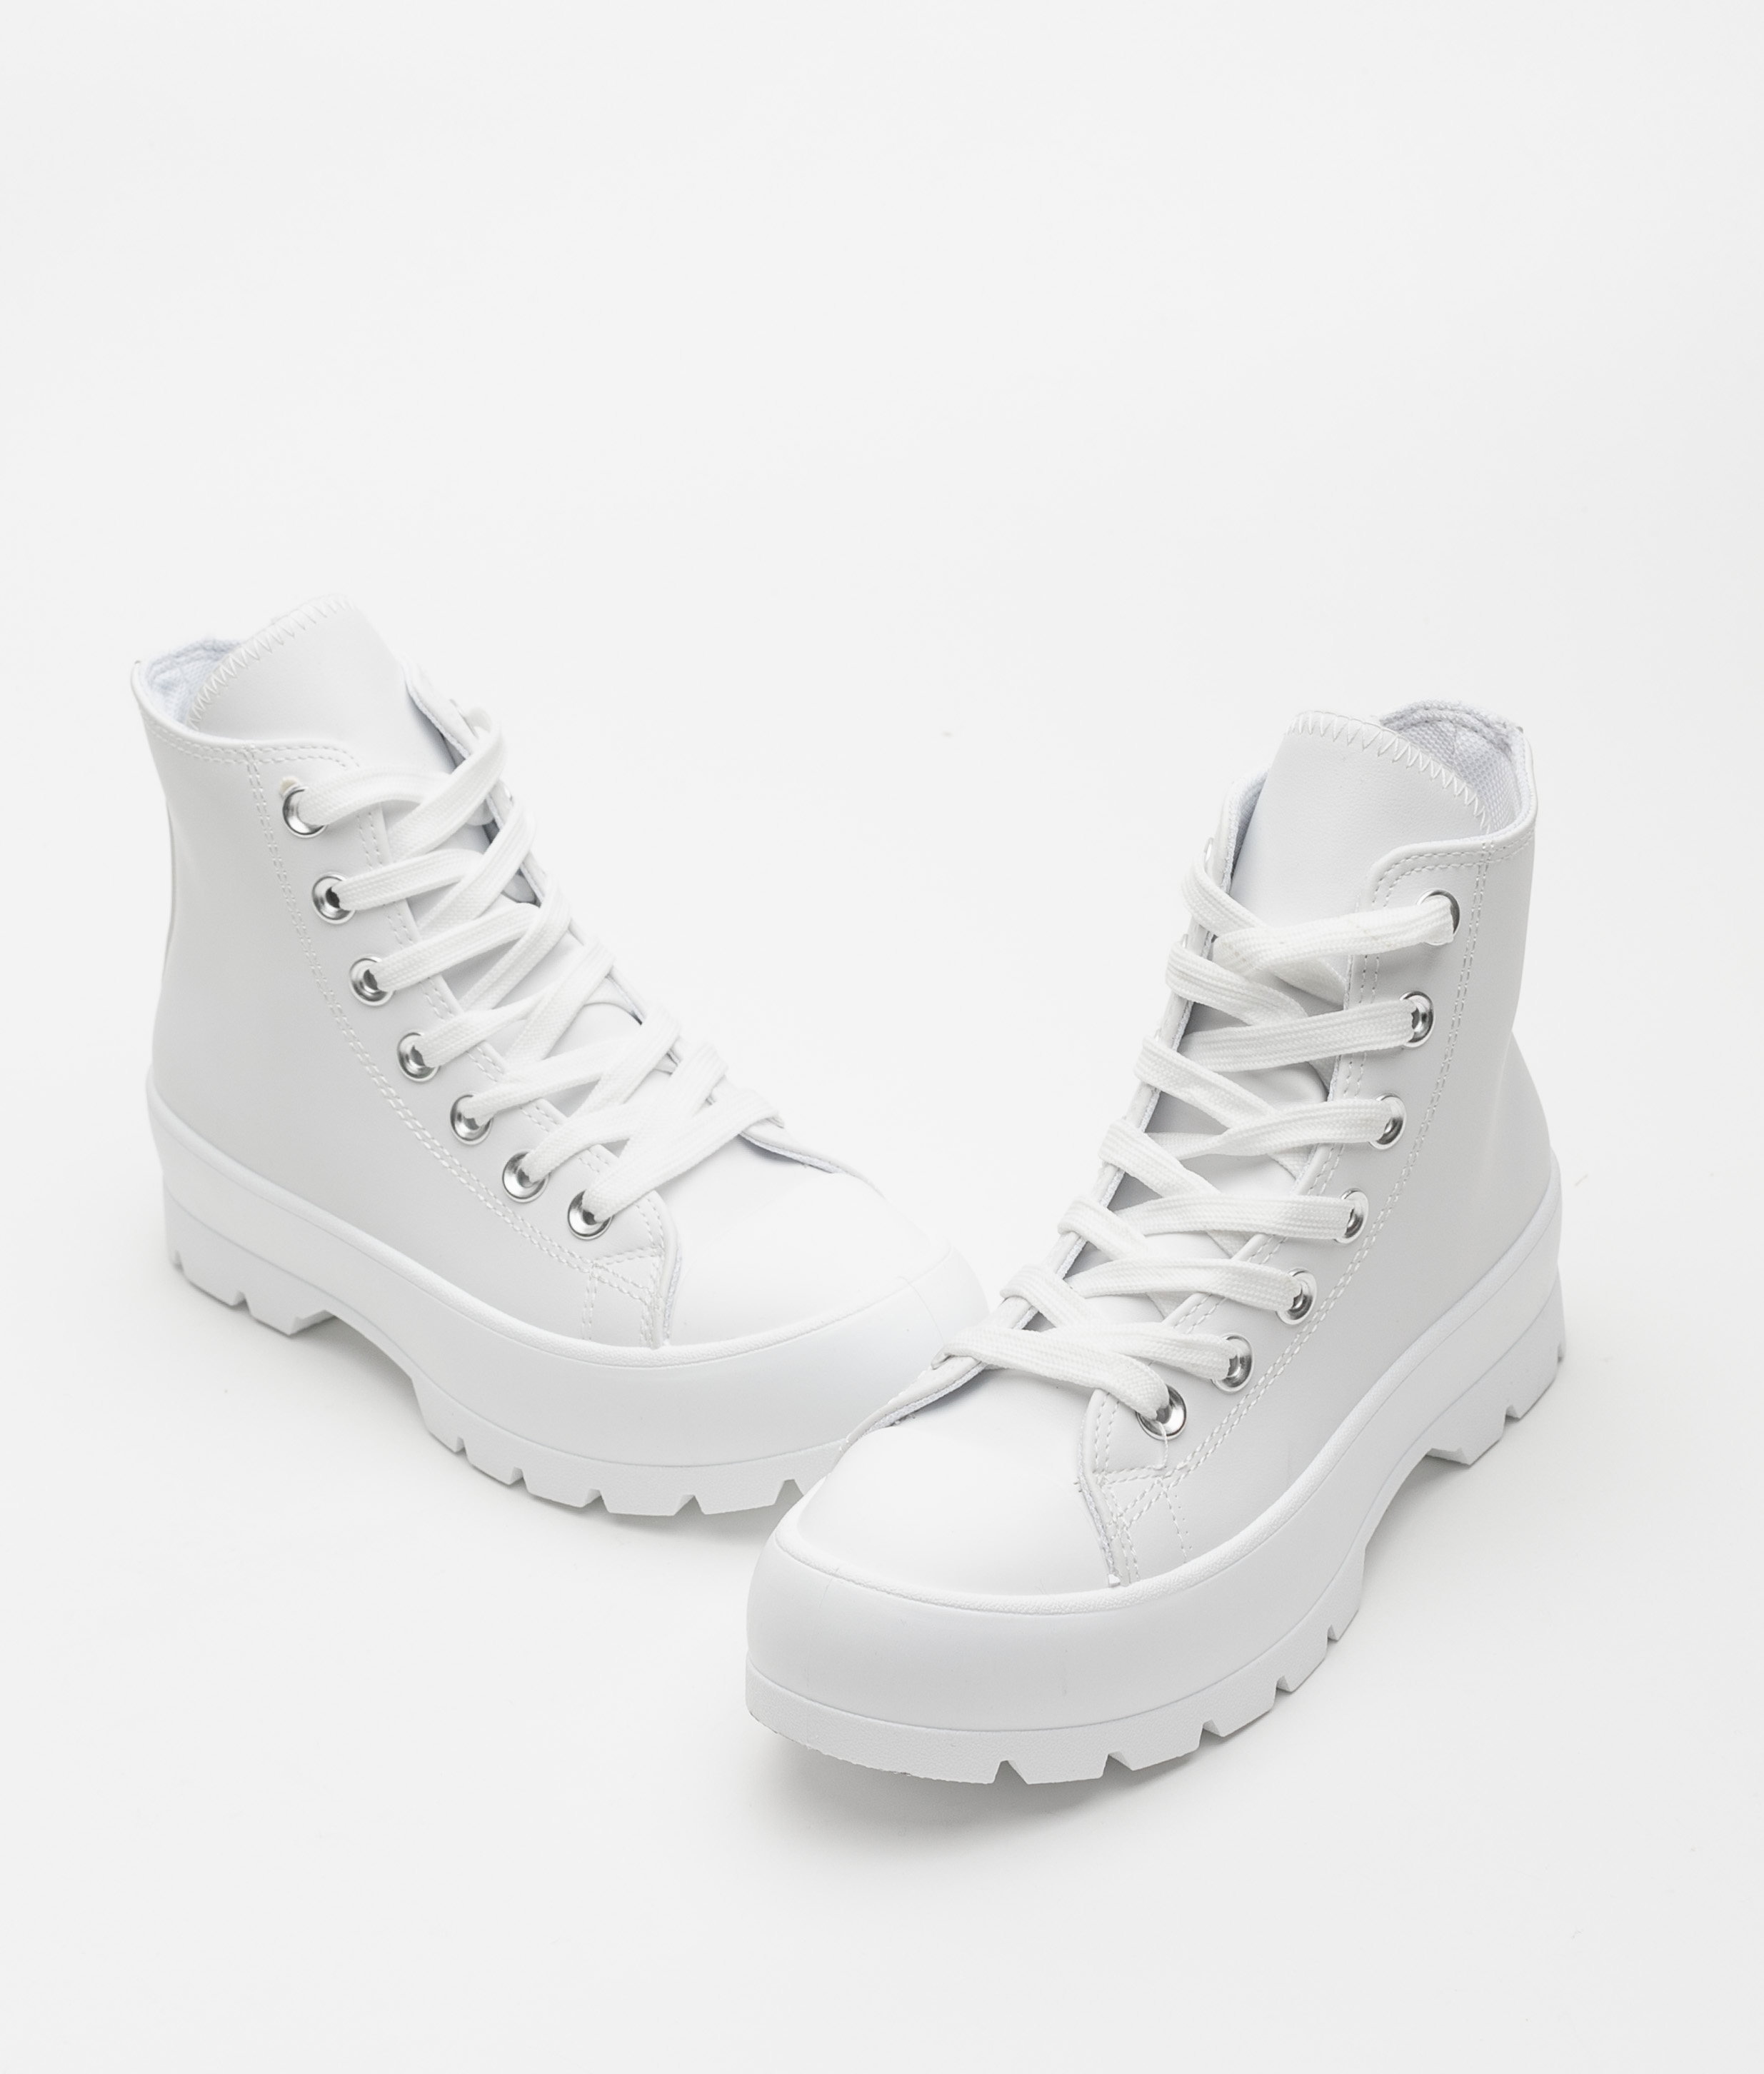 Sneakers Ludi - White Polipiel